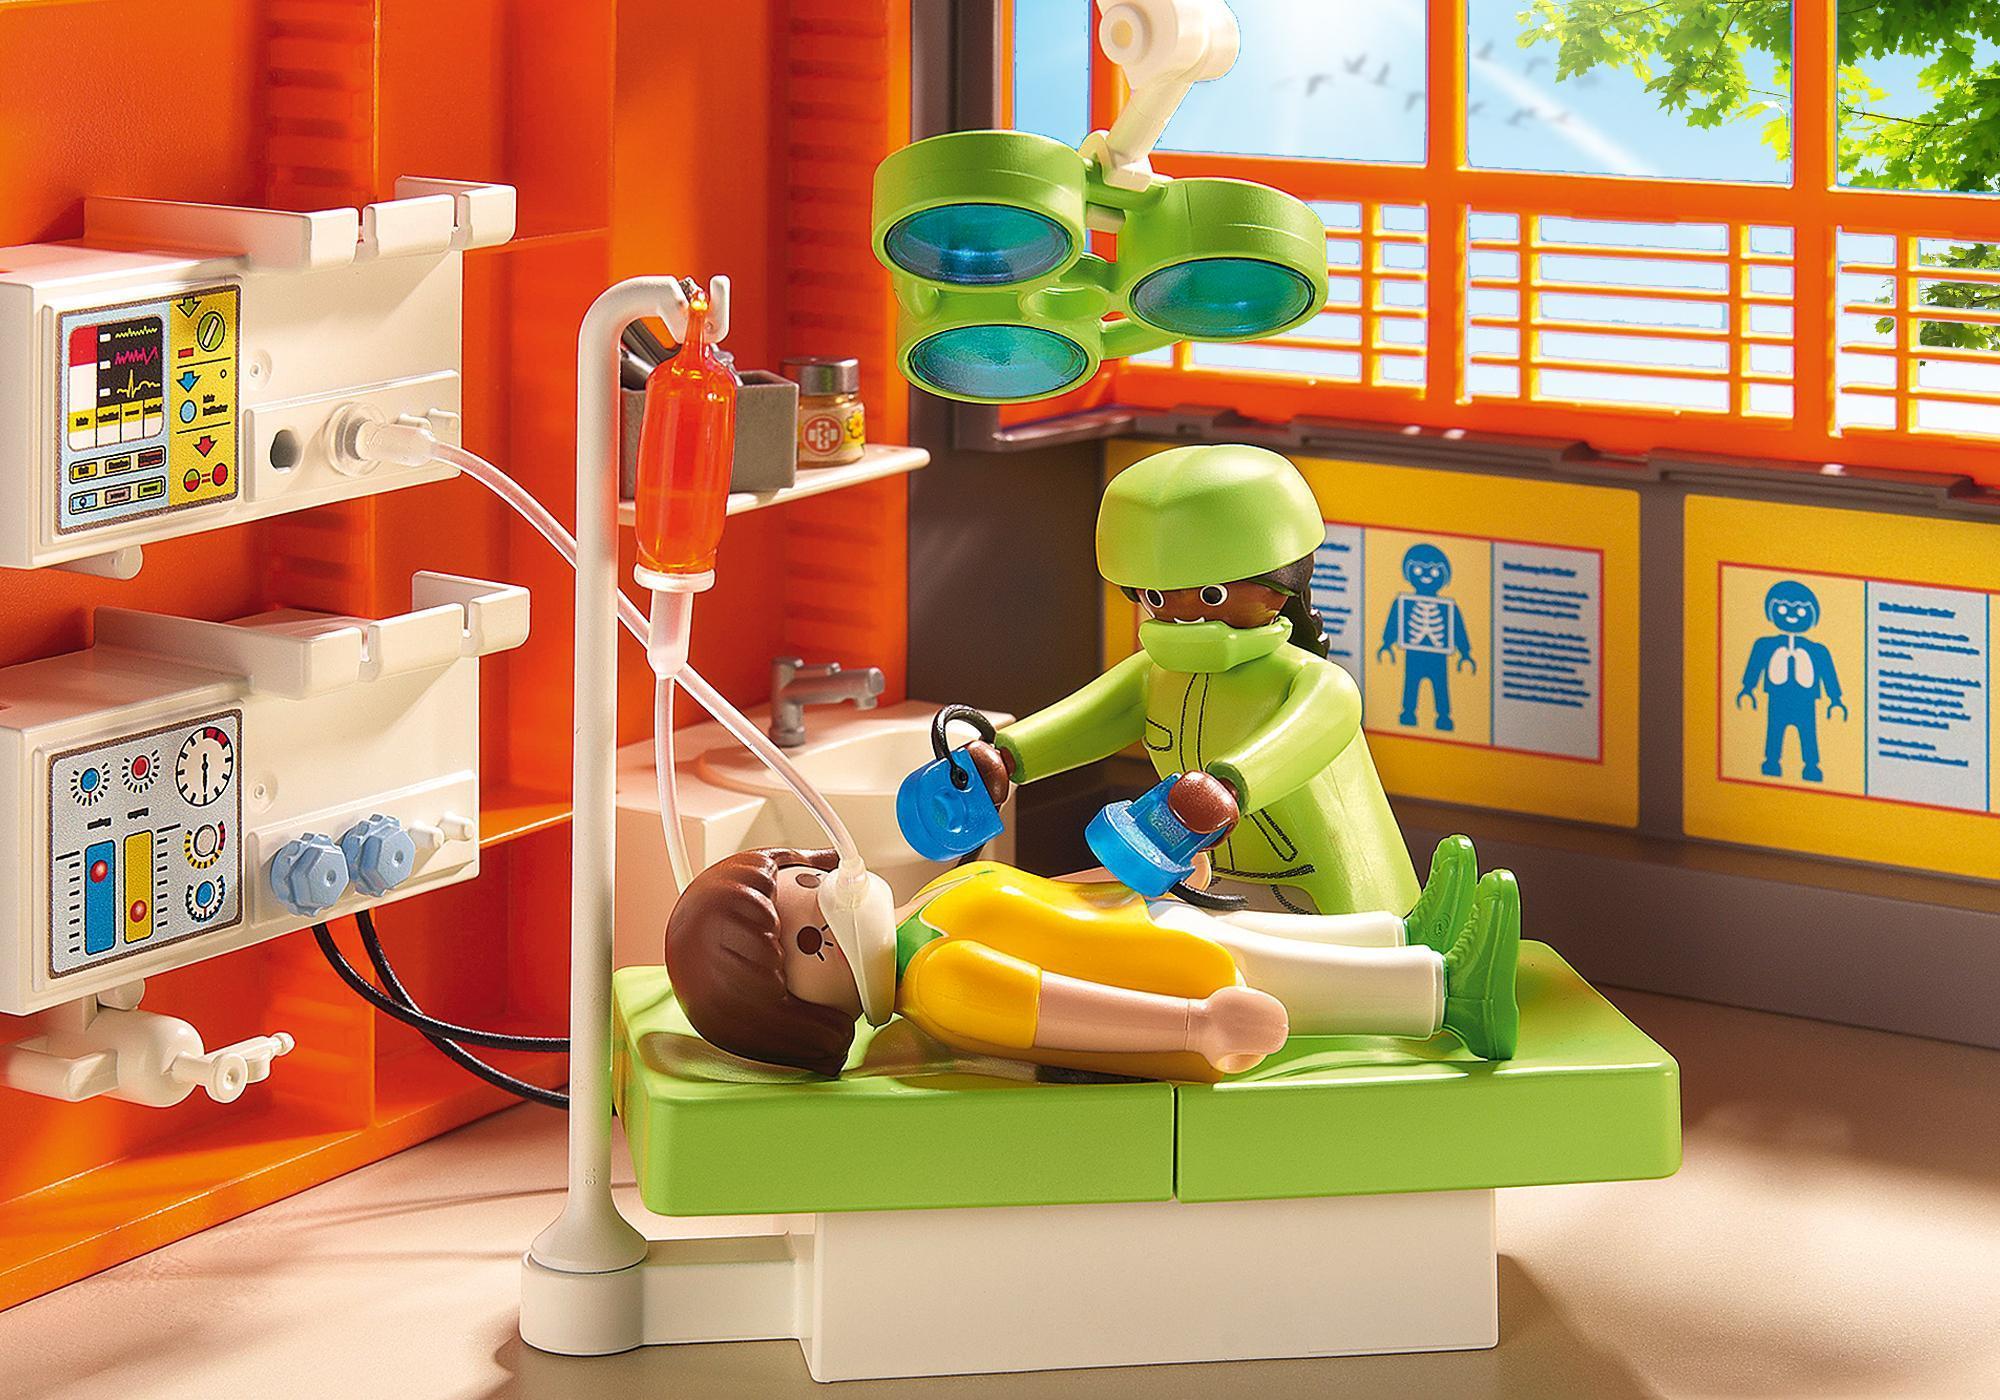 http://media.playmobil.com/i/playmobil/6657_product_extra1/Hôpital pédiatrique aménagé